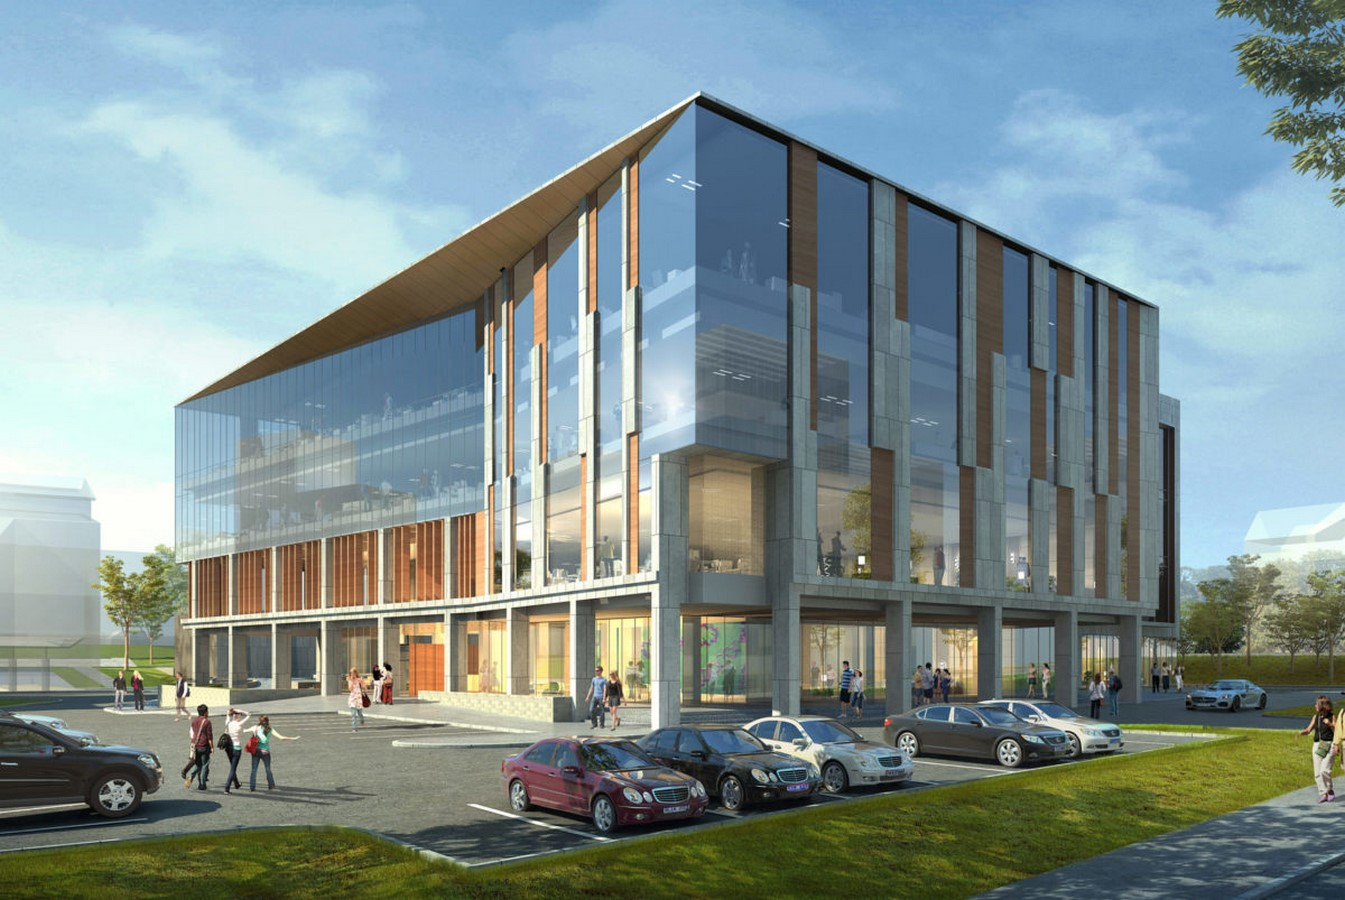 Architects in Kansas city - Top 90 Architects in Kansas city - Sheet58